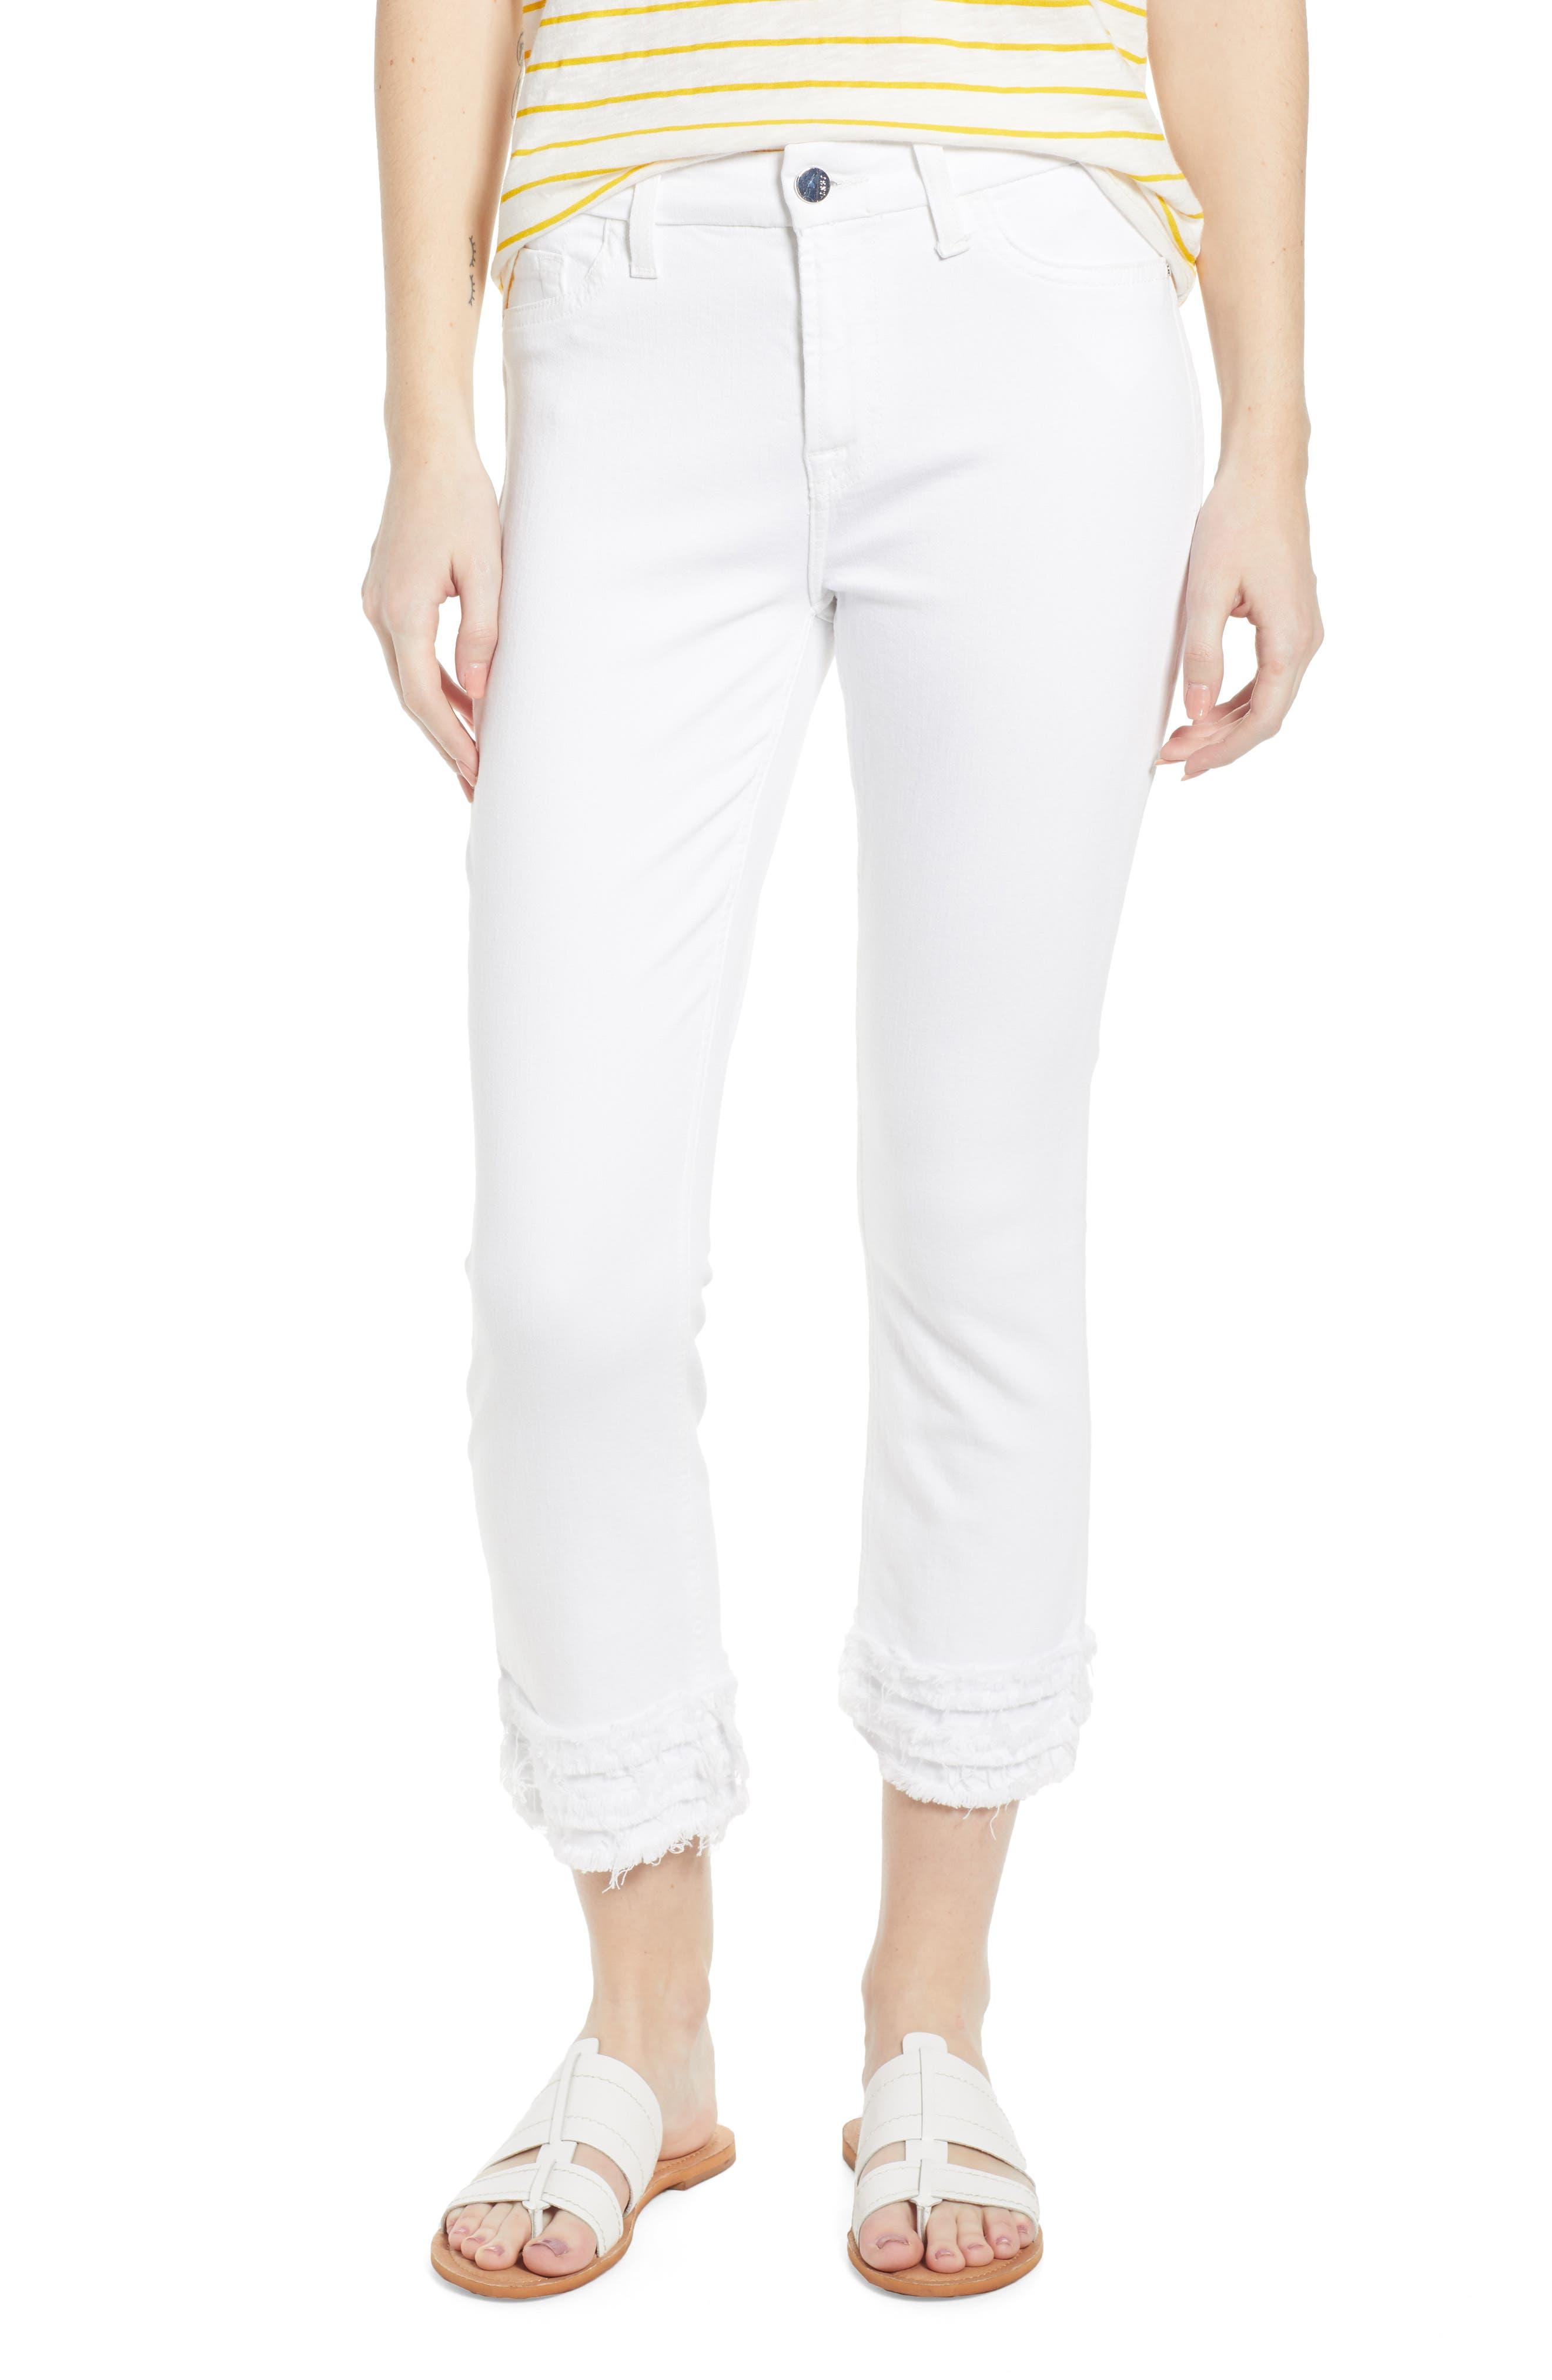 JEN7 BY 7 FOR ALL MANKIND Fringe Hem Crop Jeans, Main, color, WHITE FASHION